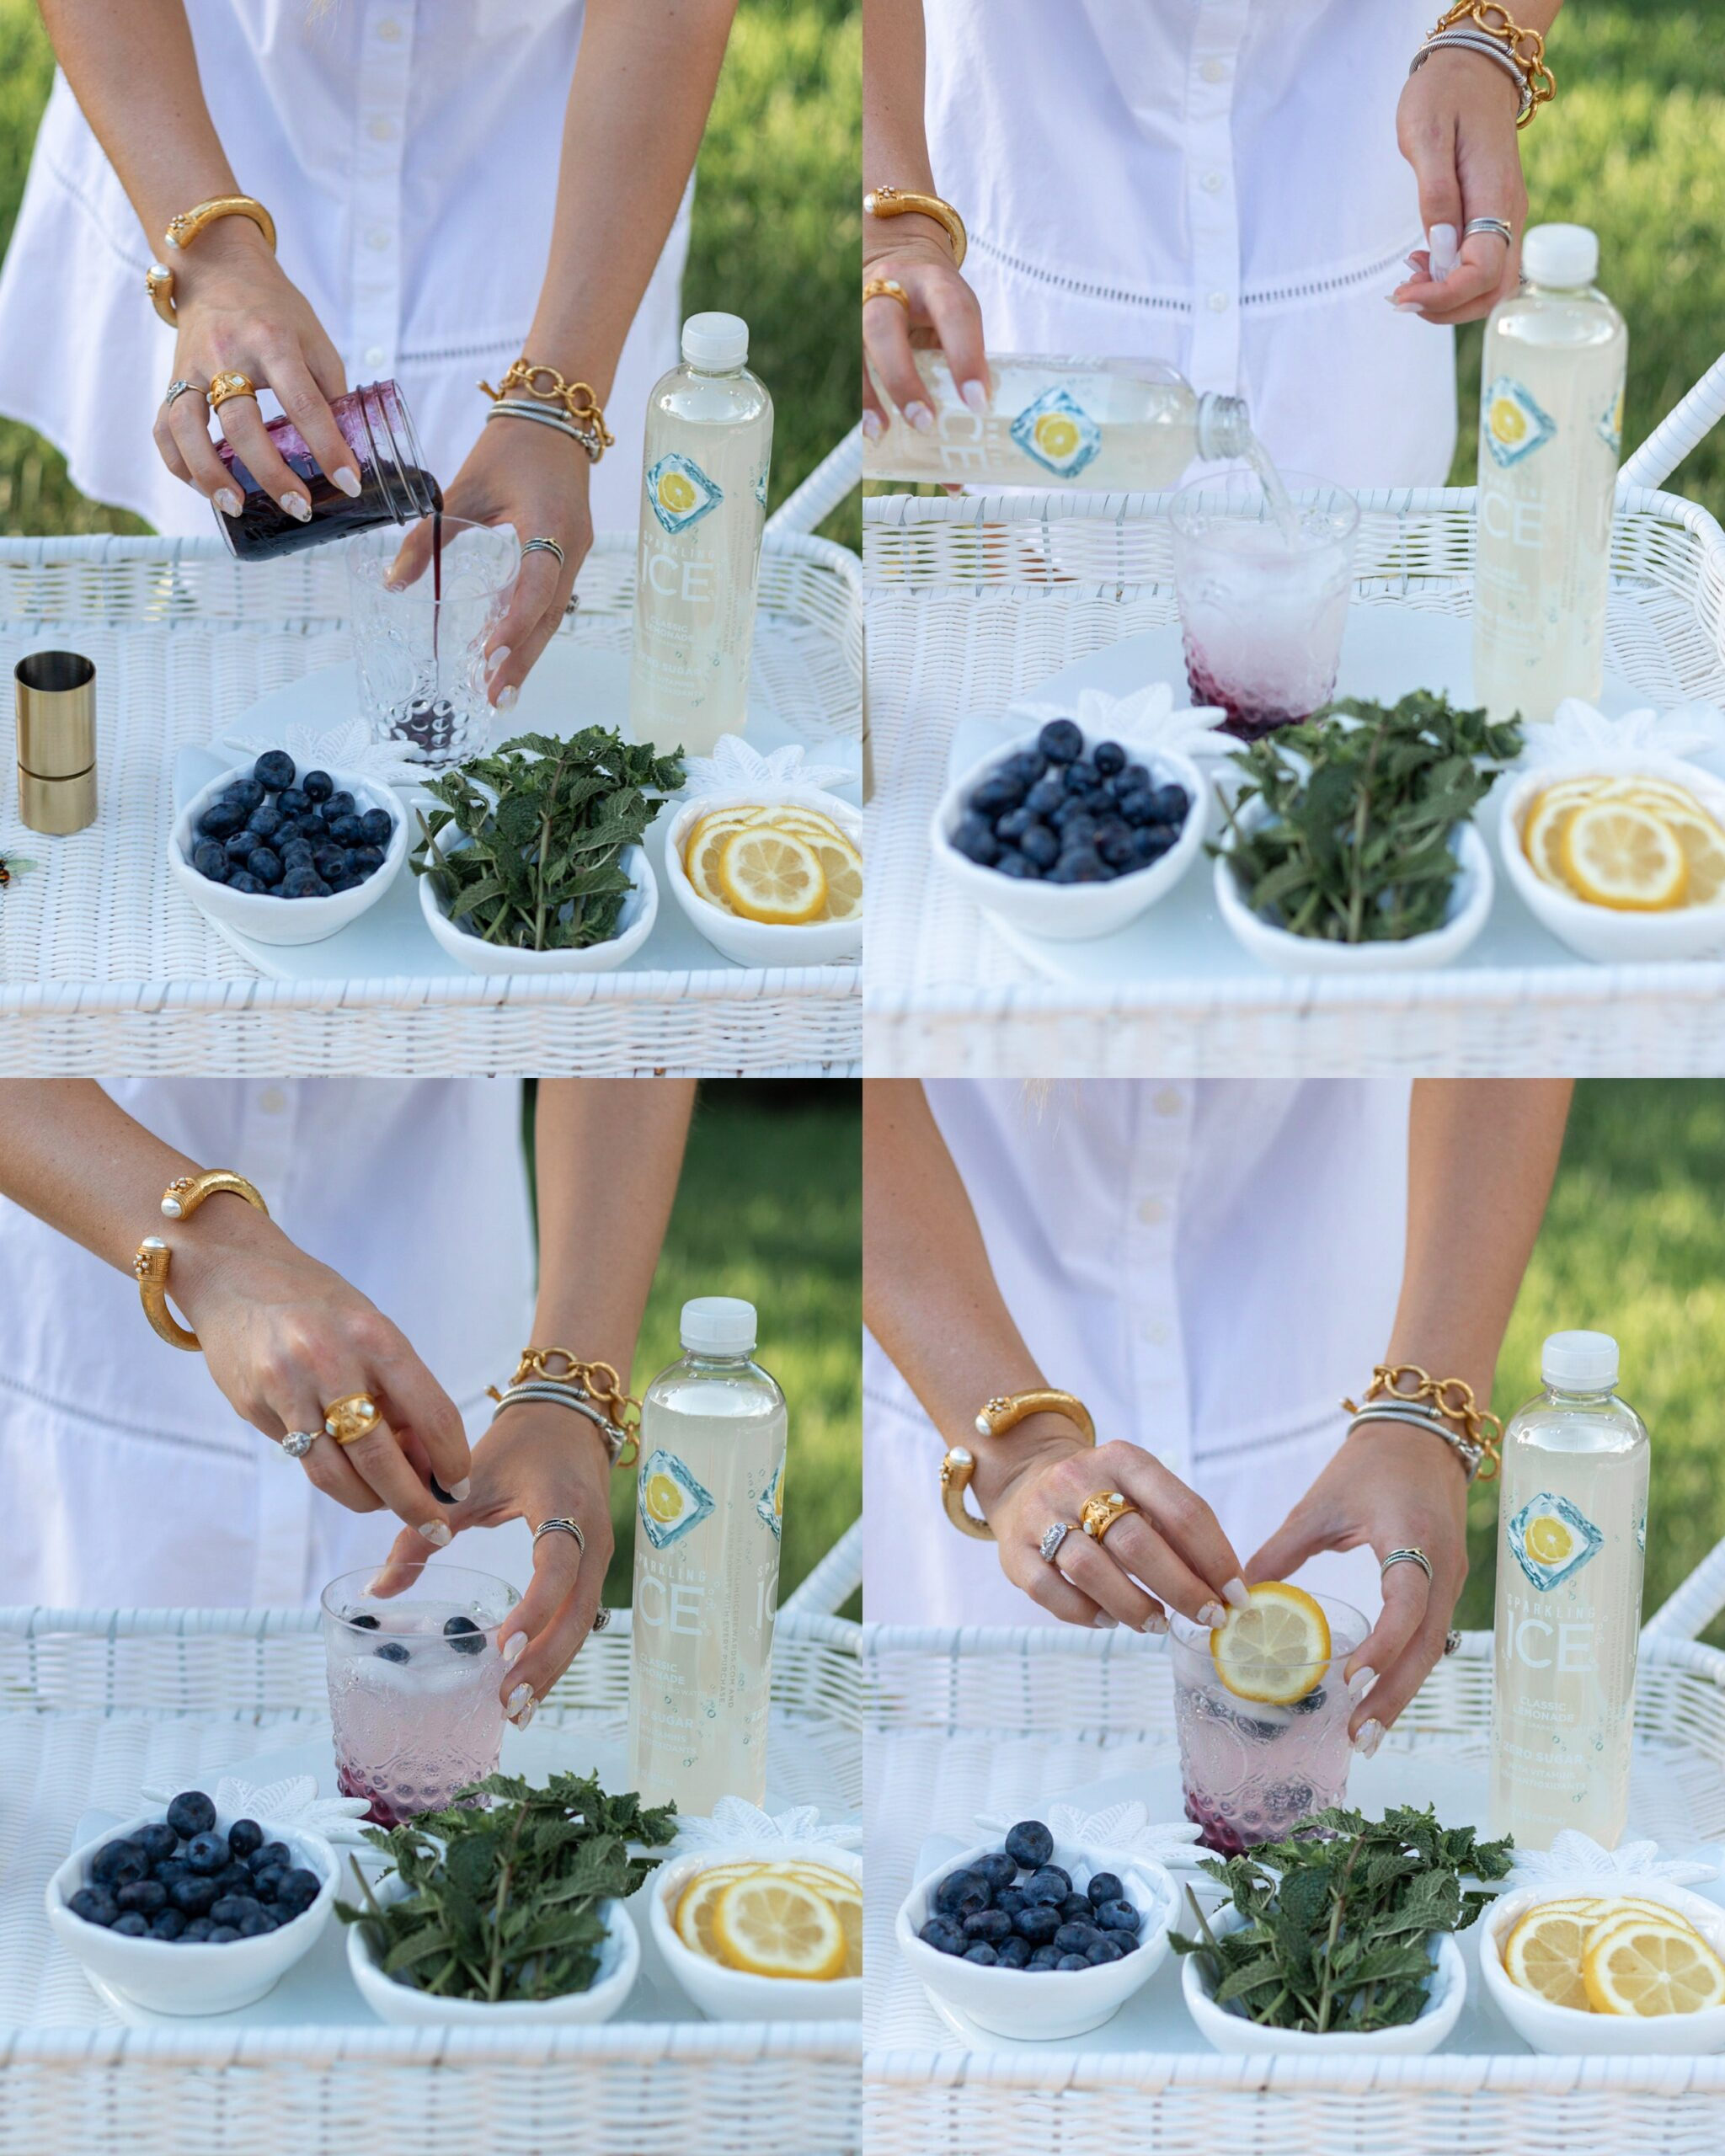 HOW TO MAKE BLUEBERRY LEMONADE